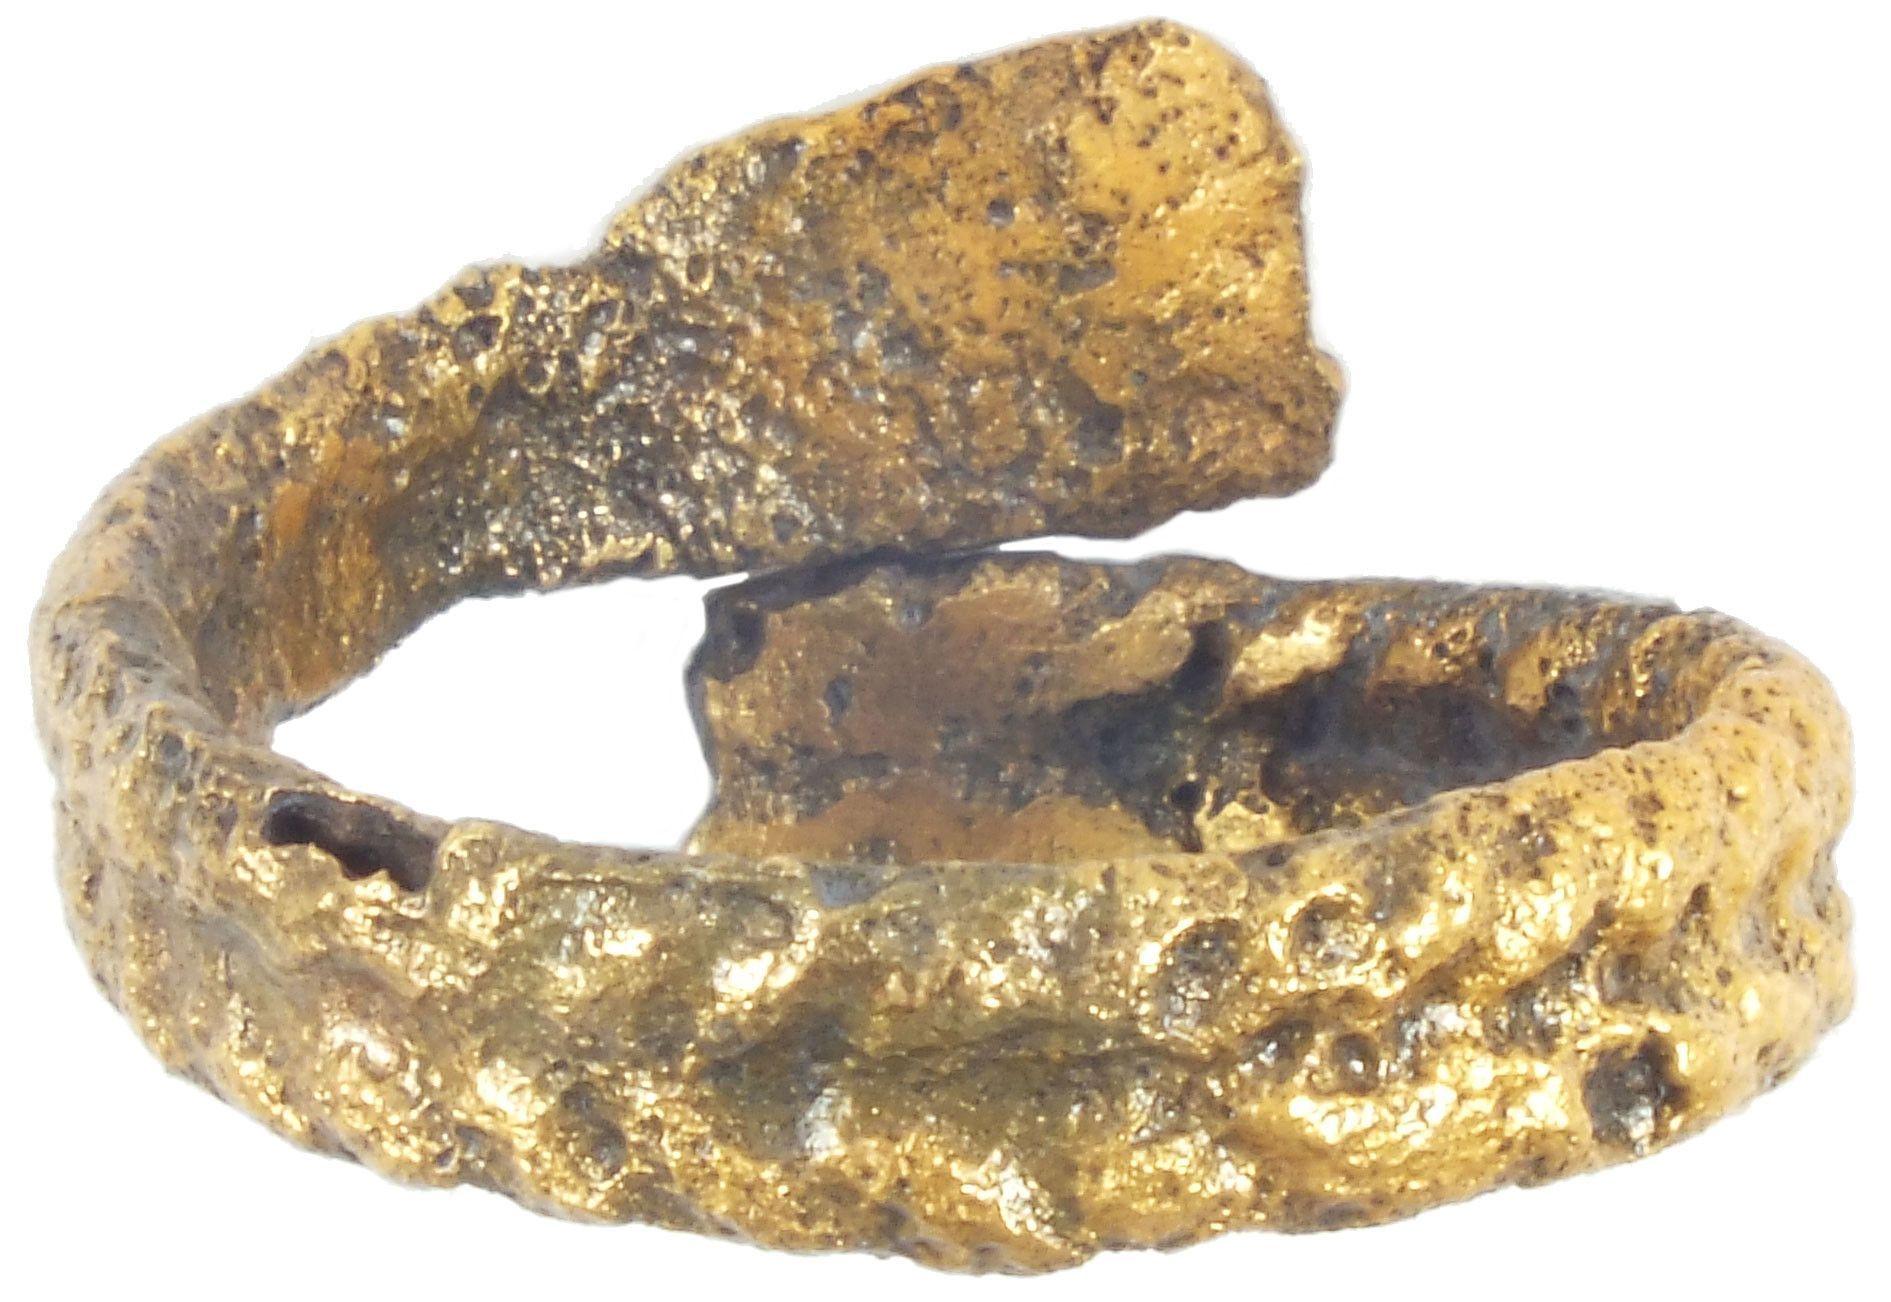 VIKING WARRIOR'S RING 9th10th CENTURY AD Viking warrior